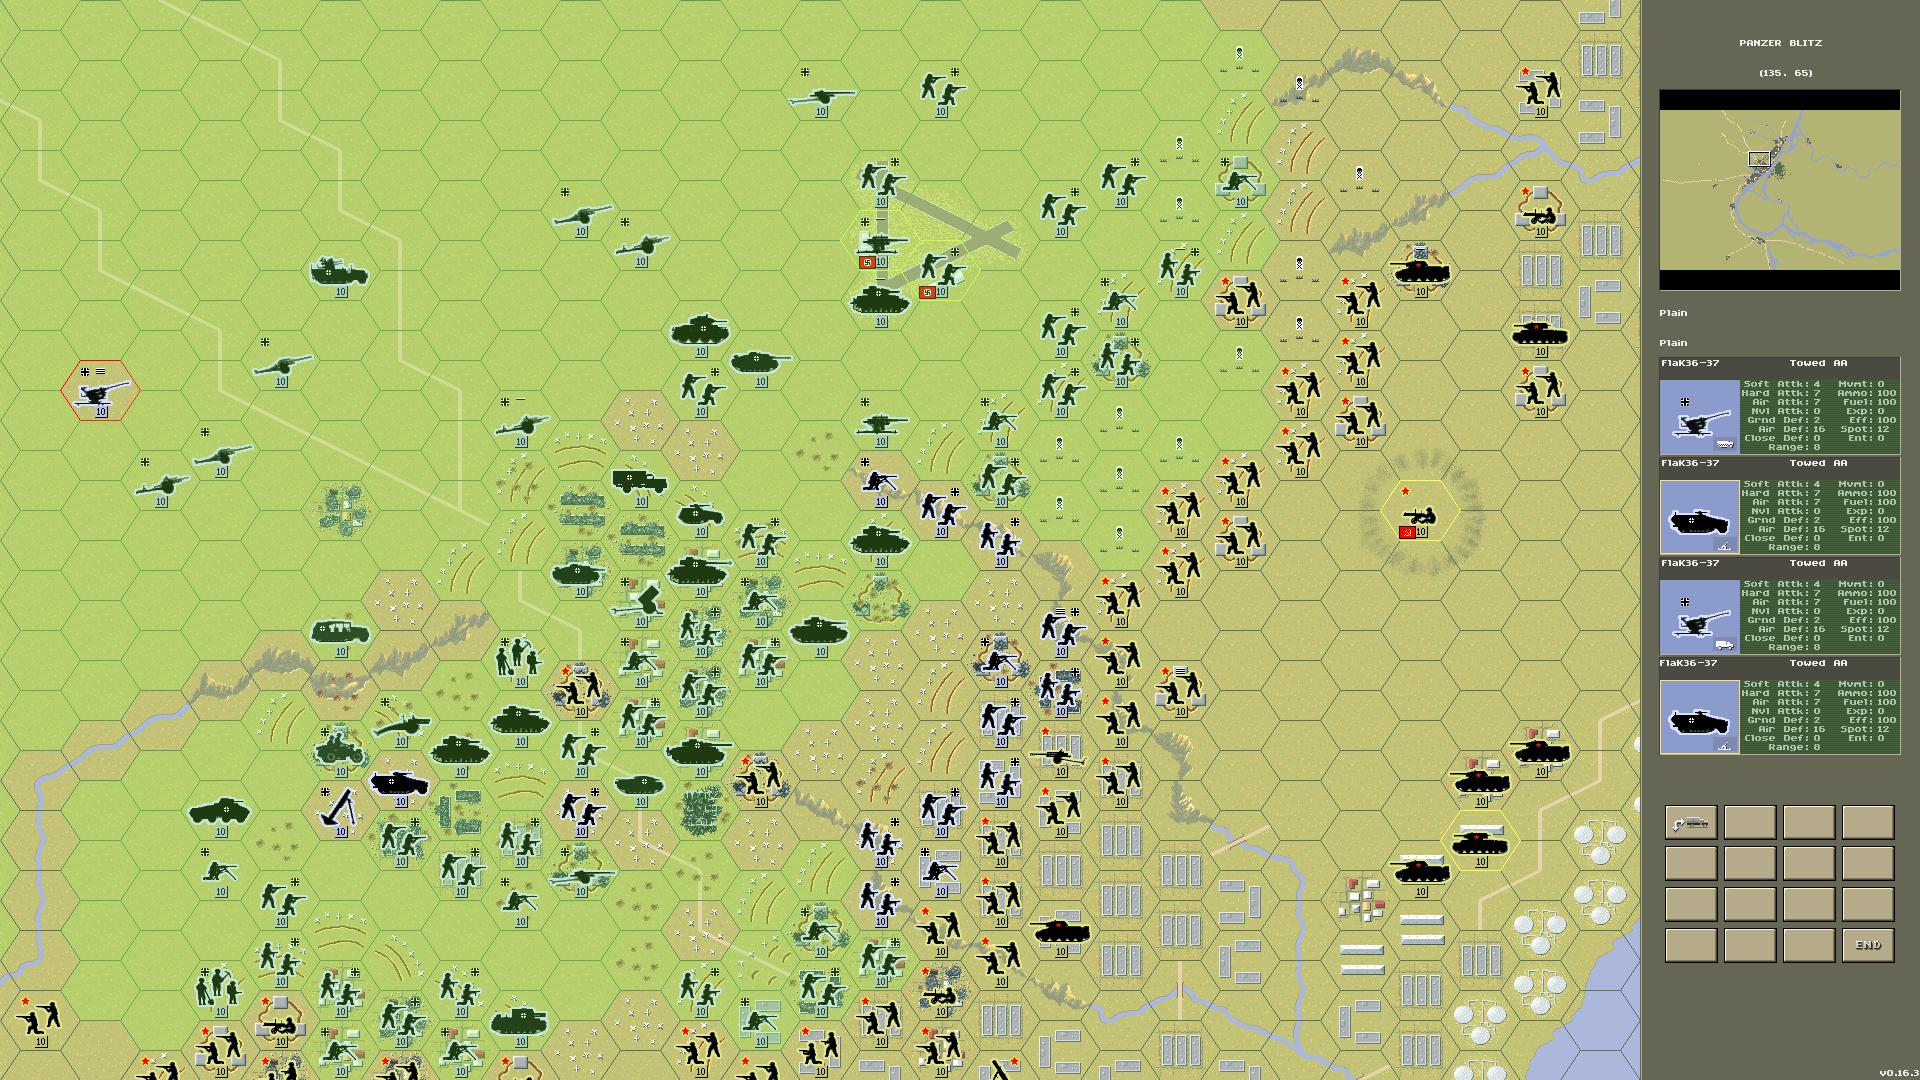 Moongate Software - Panzer Blitz Dev Blog